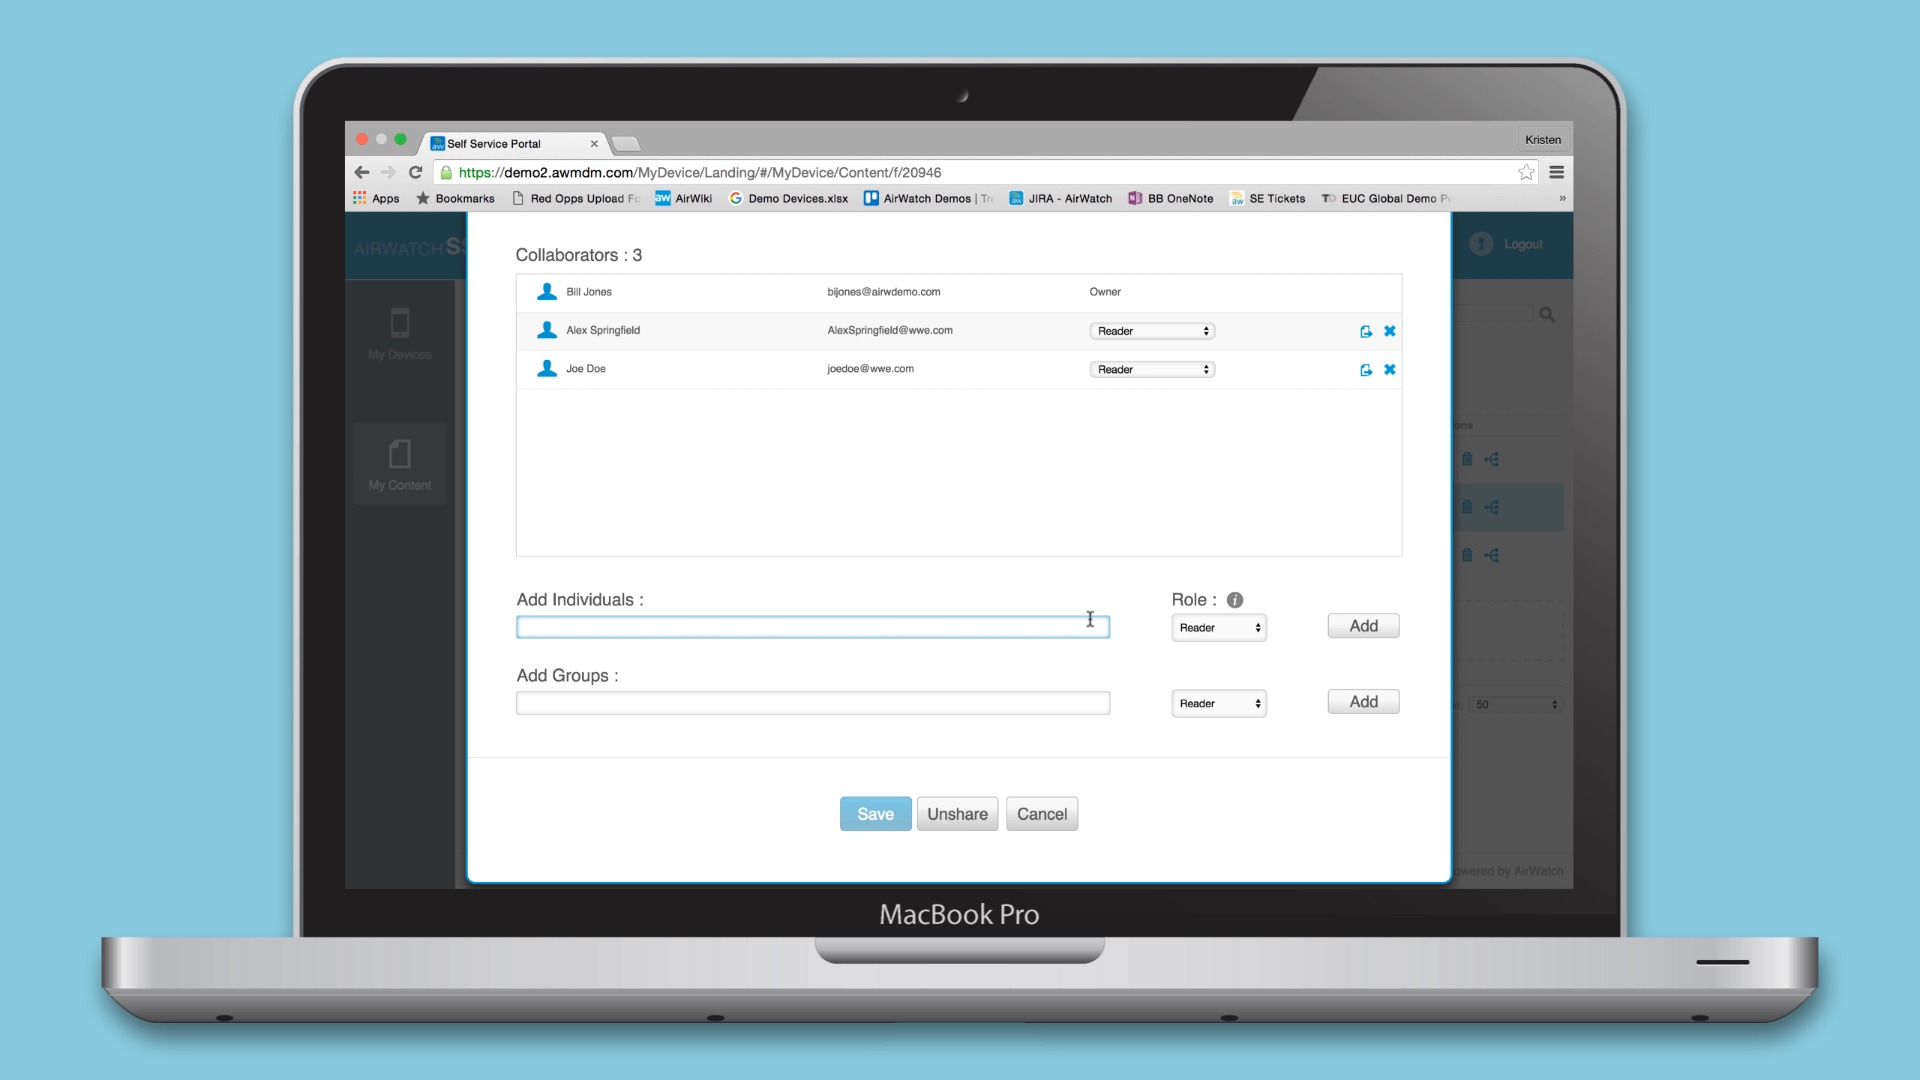 AirWatch's Mobile Content Management (MCM)